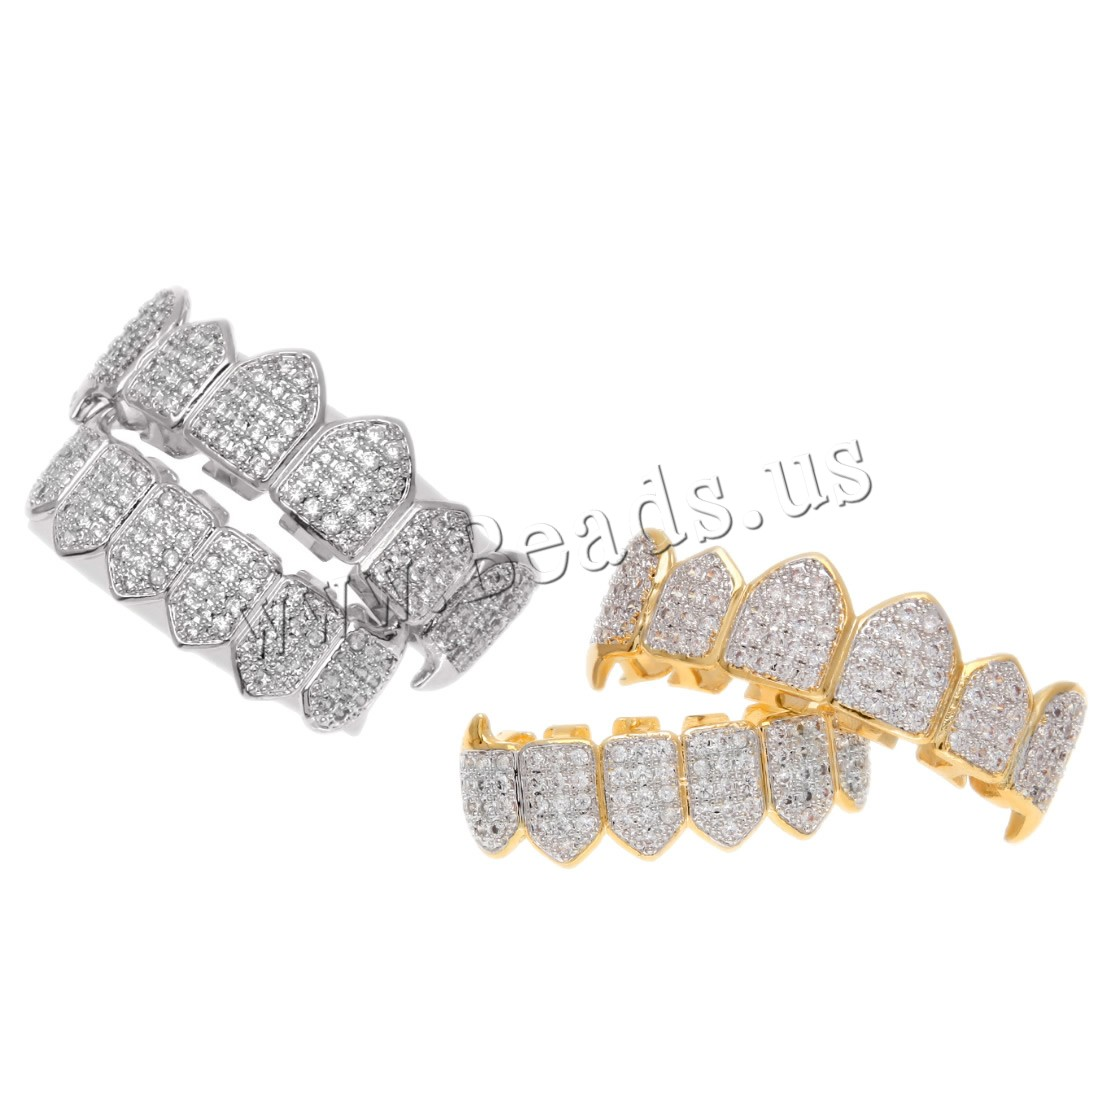 Buy Brass Hip Hop Teeth Grillz plated Unisex & rhinestone colors choice nickel lead & cadmium free 40x11mm 50x14mm Sold PC